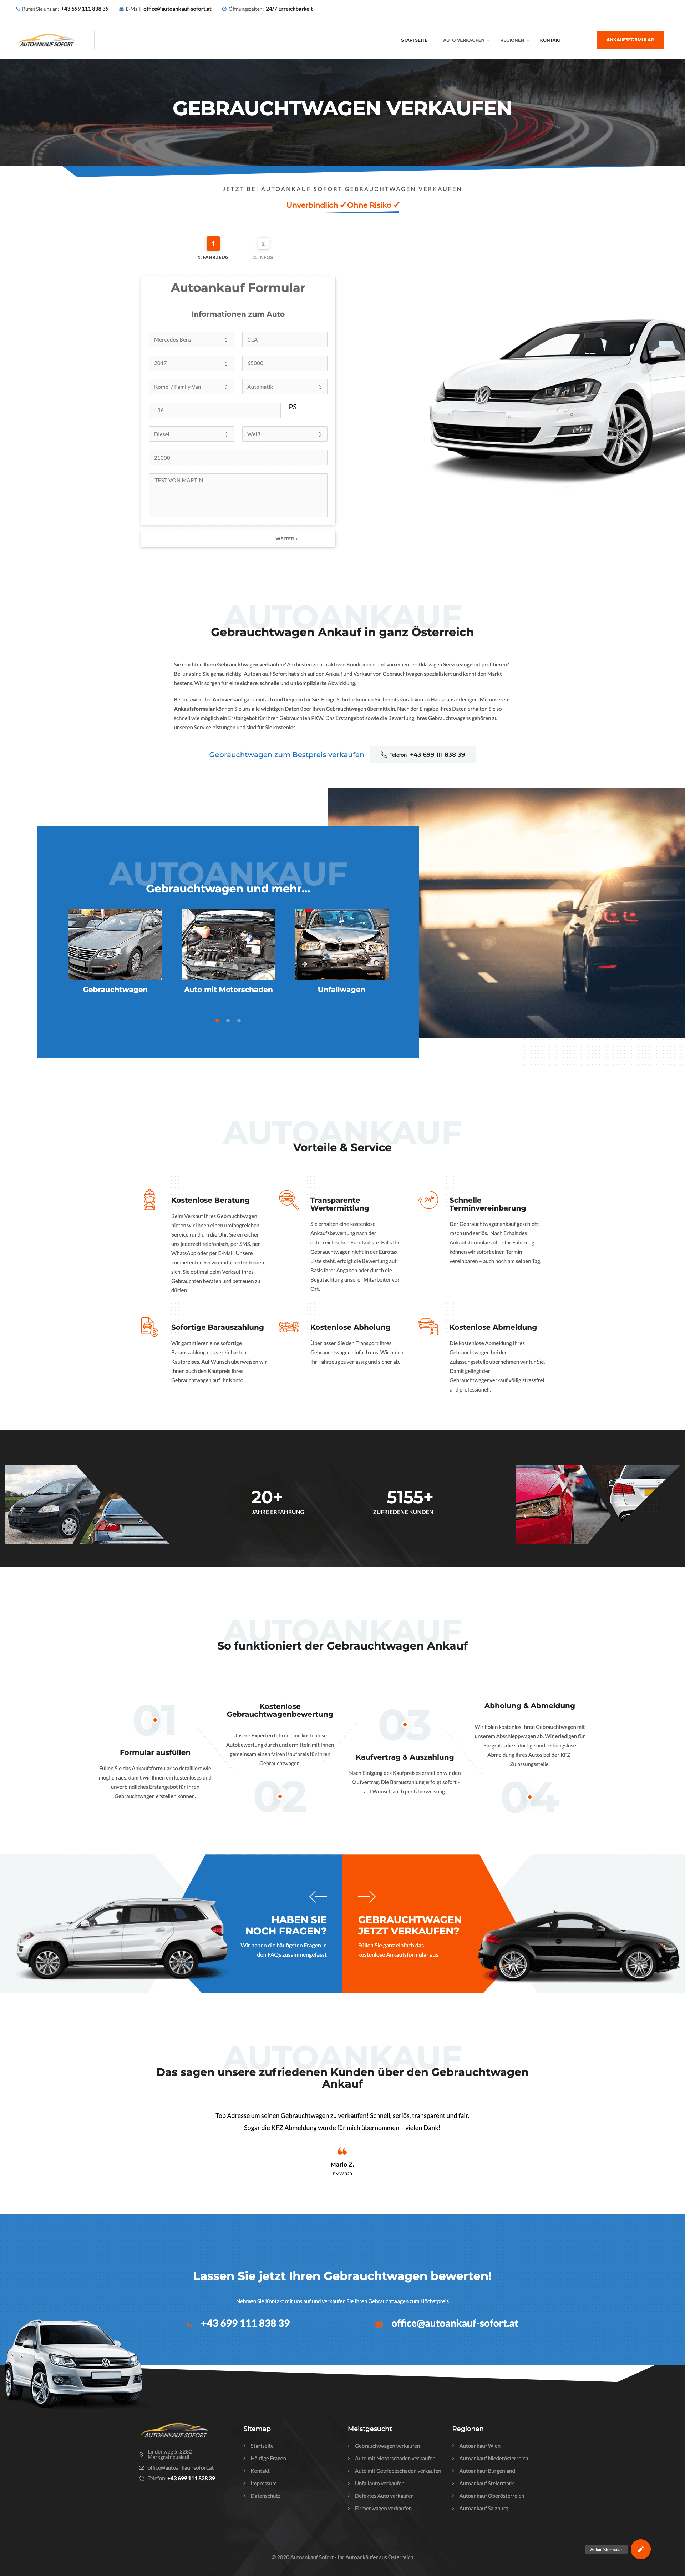 Projekt Autoankauf Sofort Website SEO Google Ads (2)